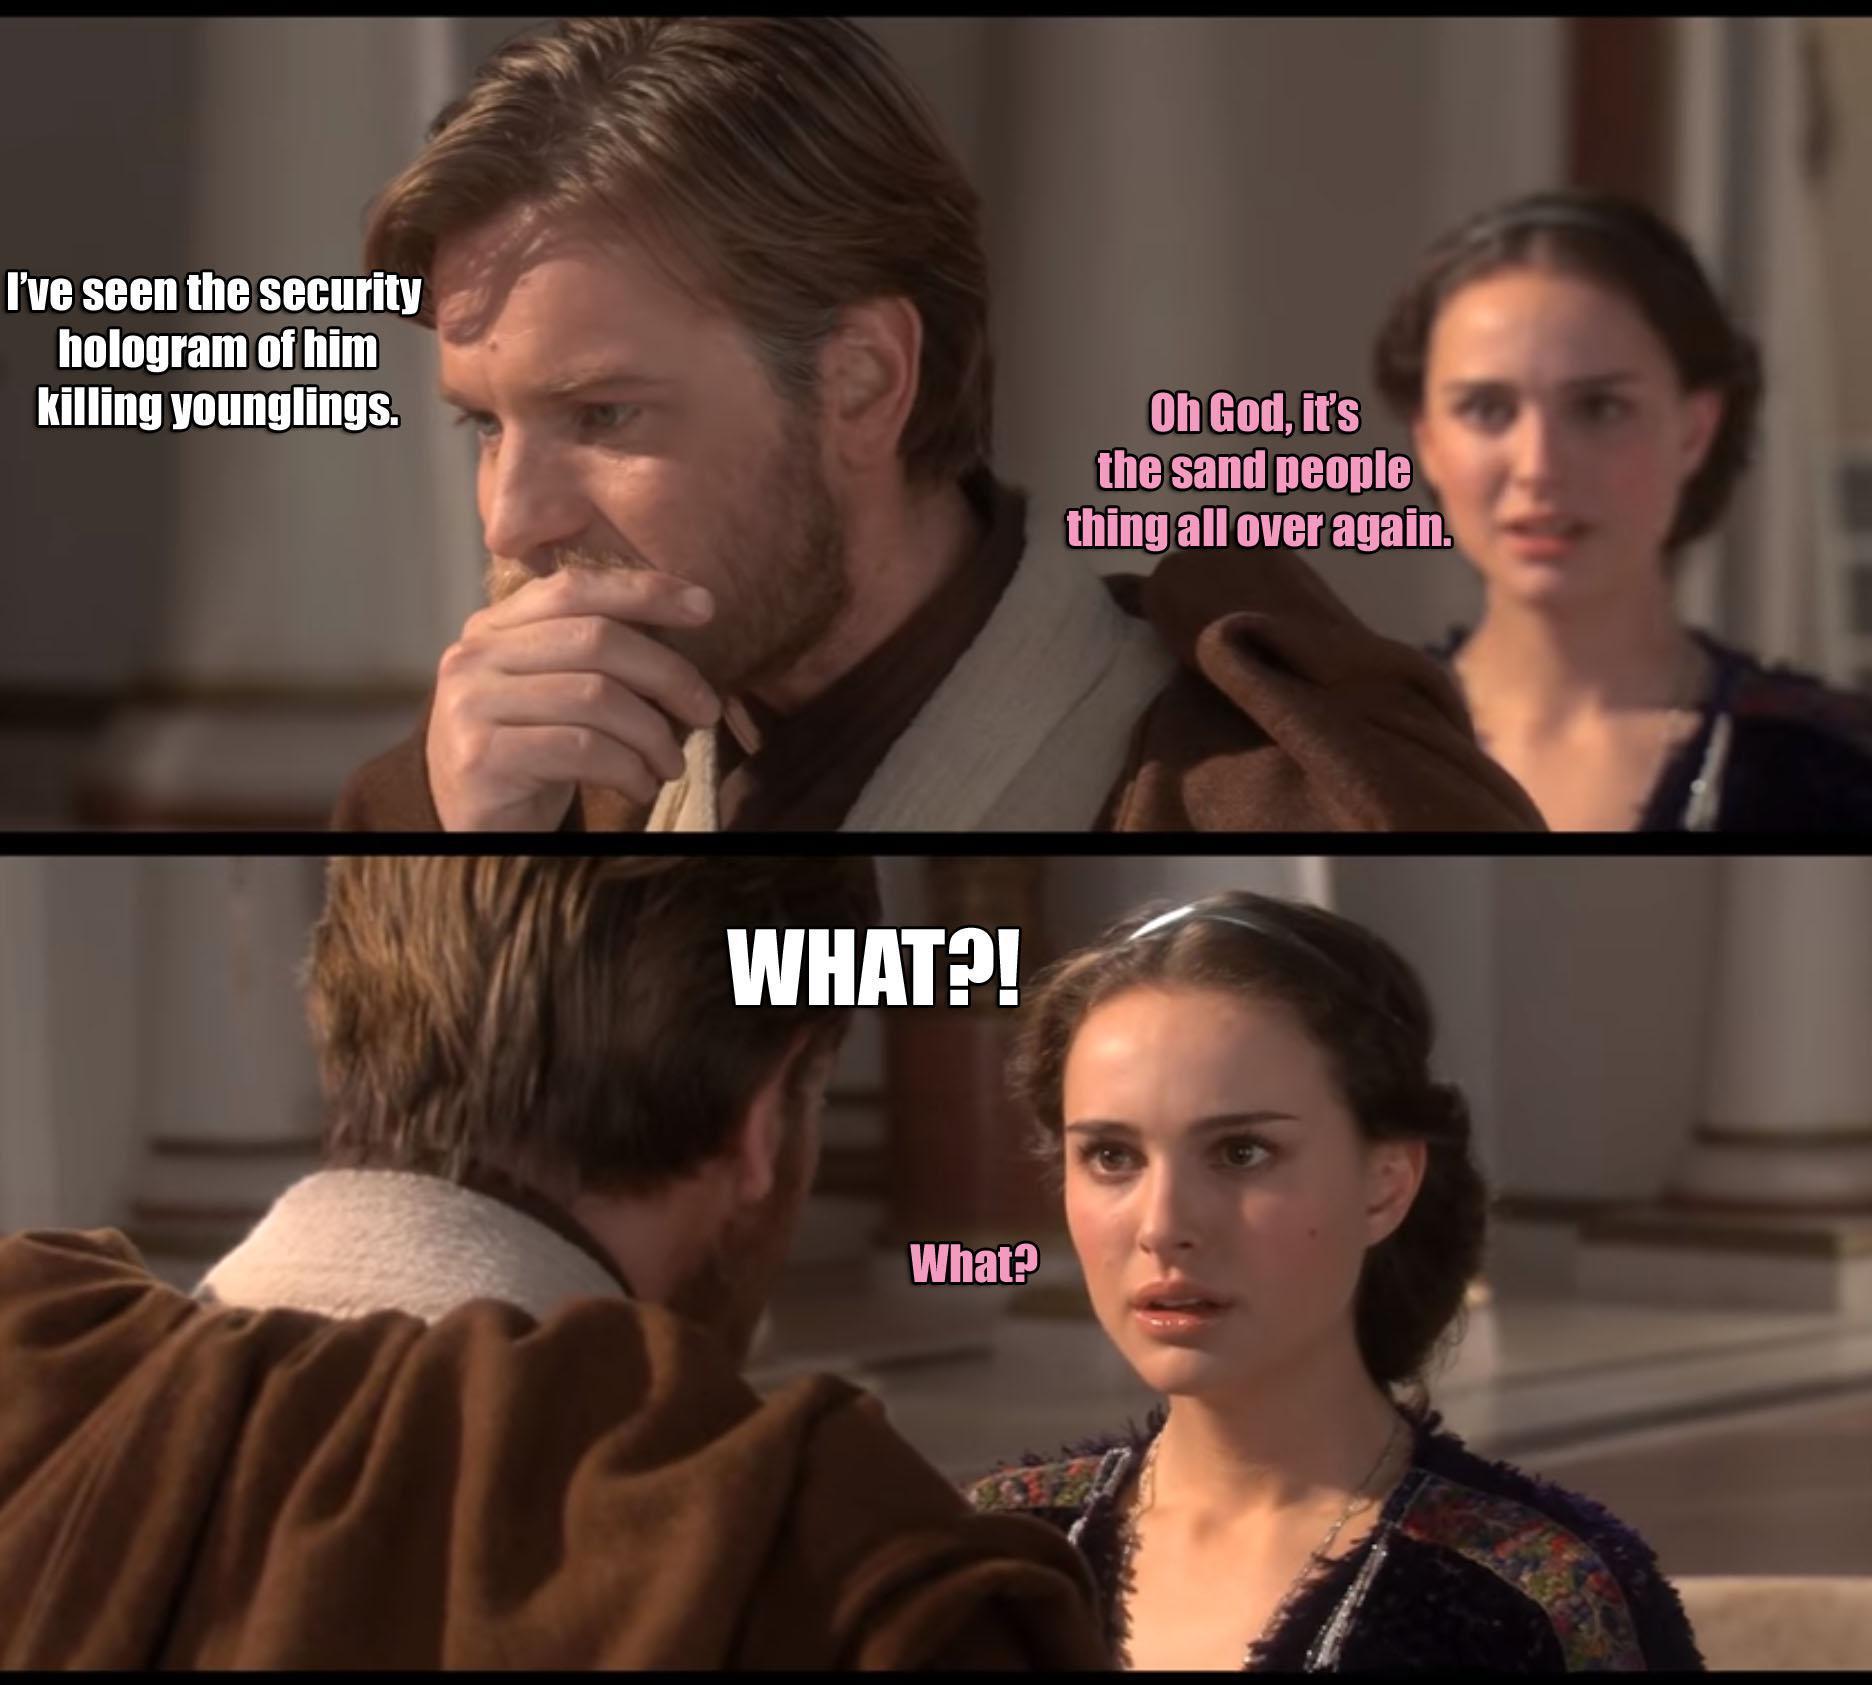 Dammit Padme, love is forbidden for a Jedi - meme